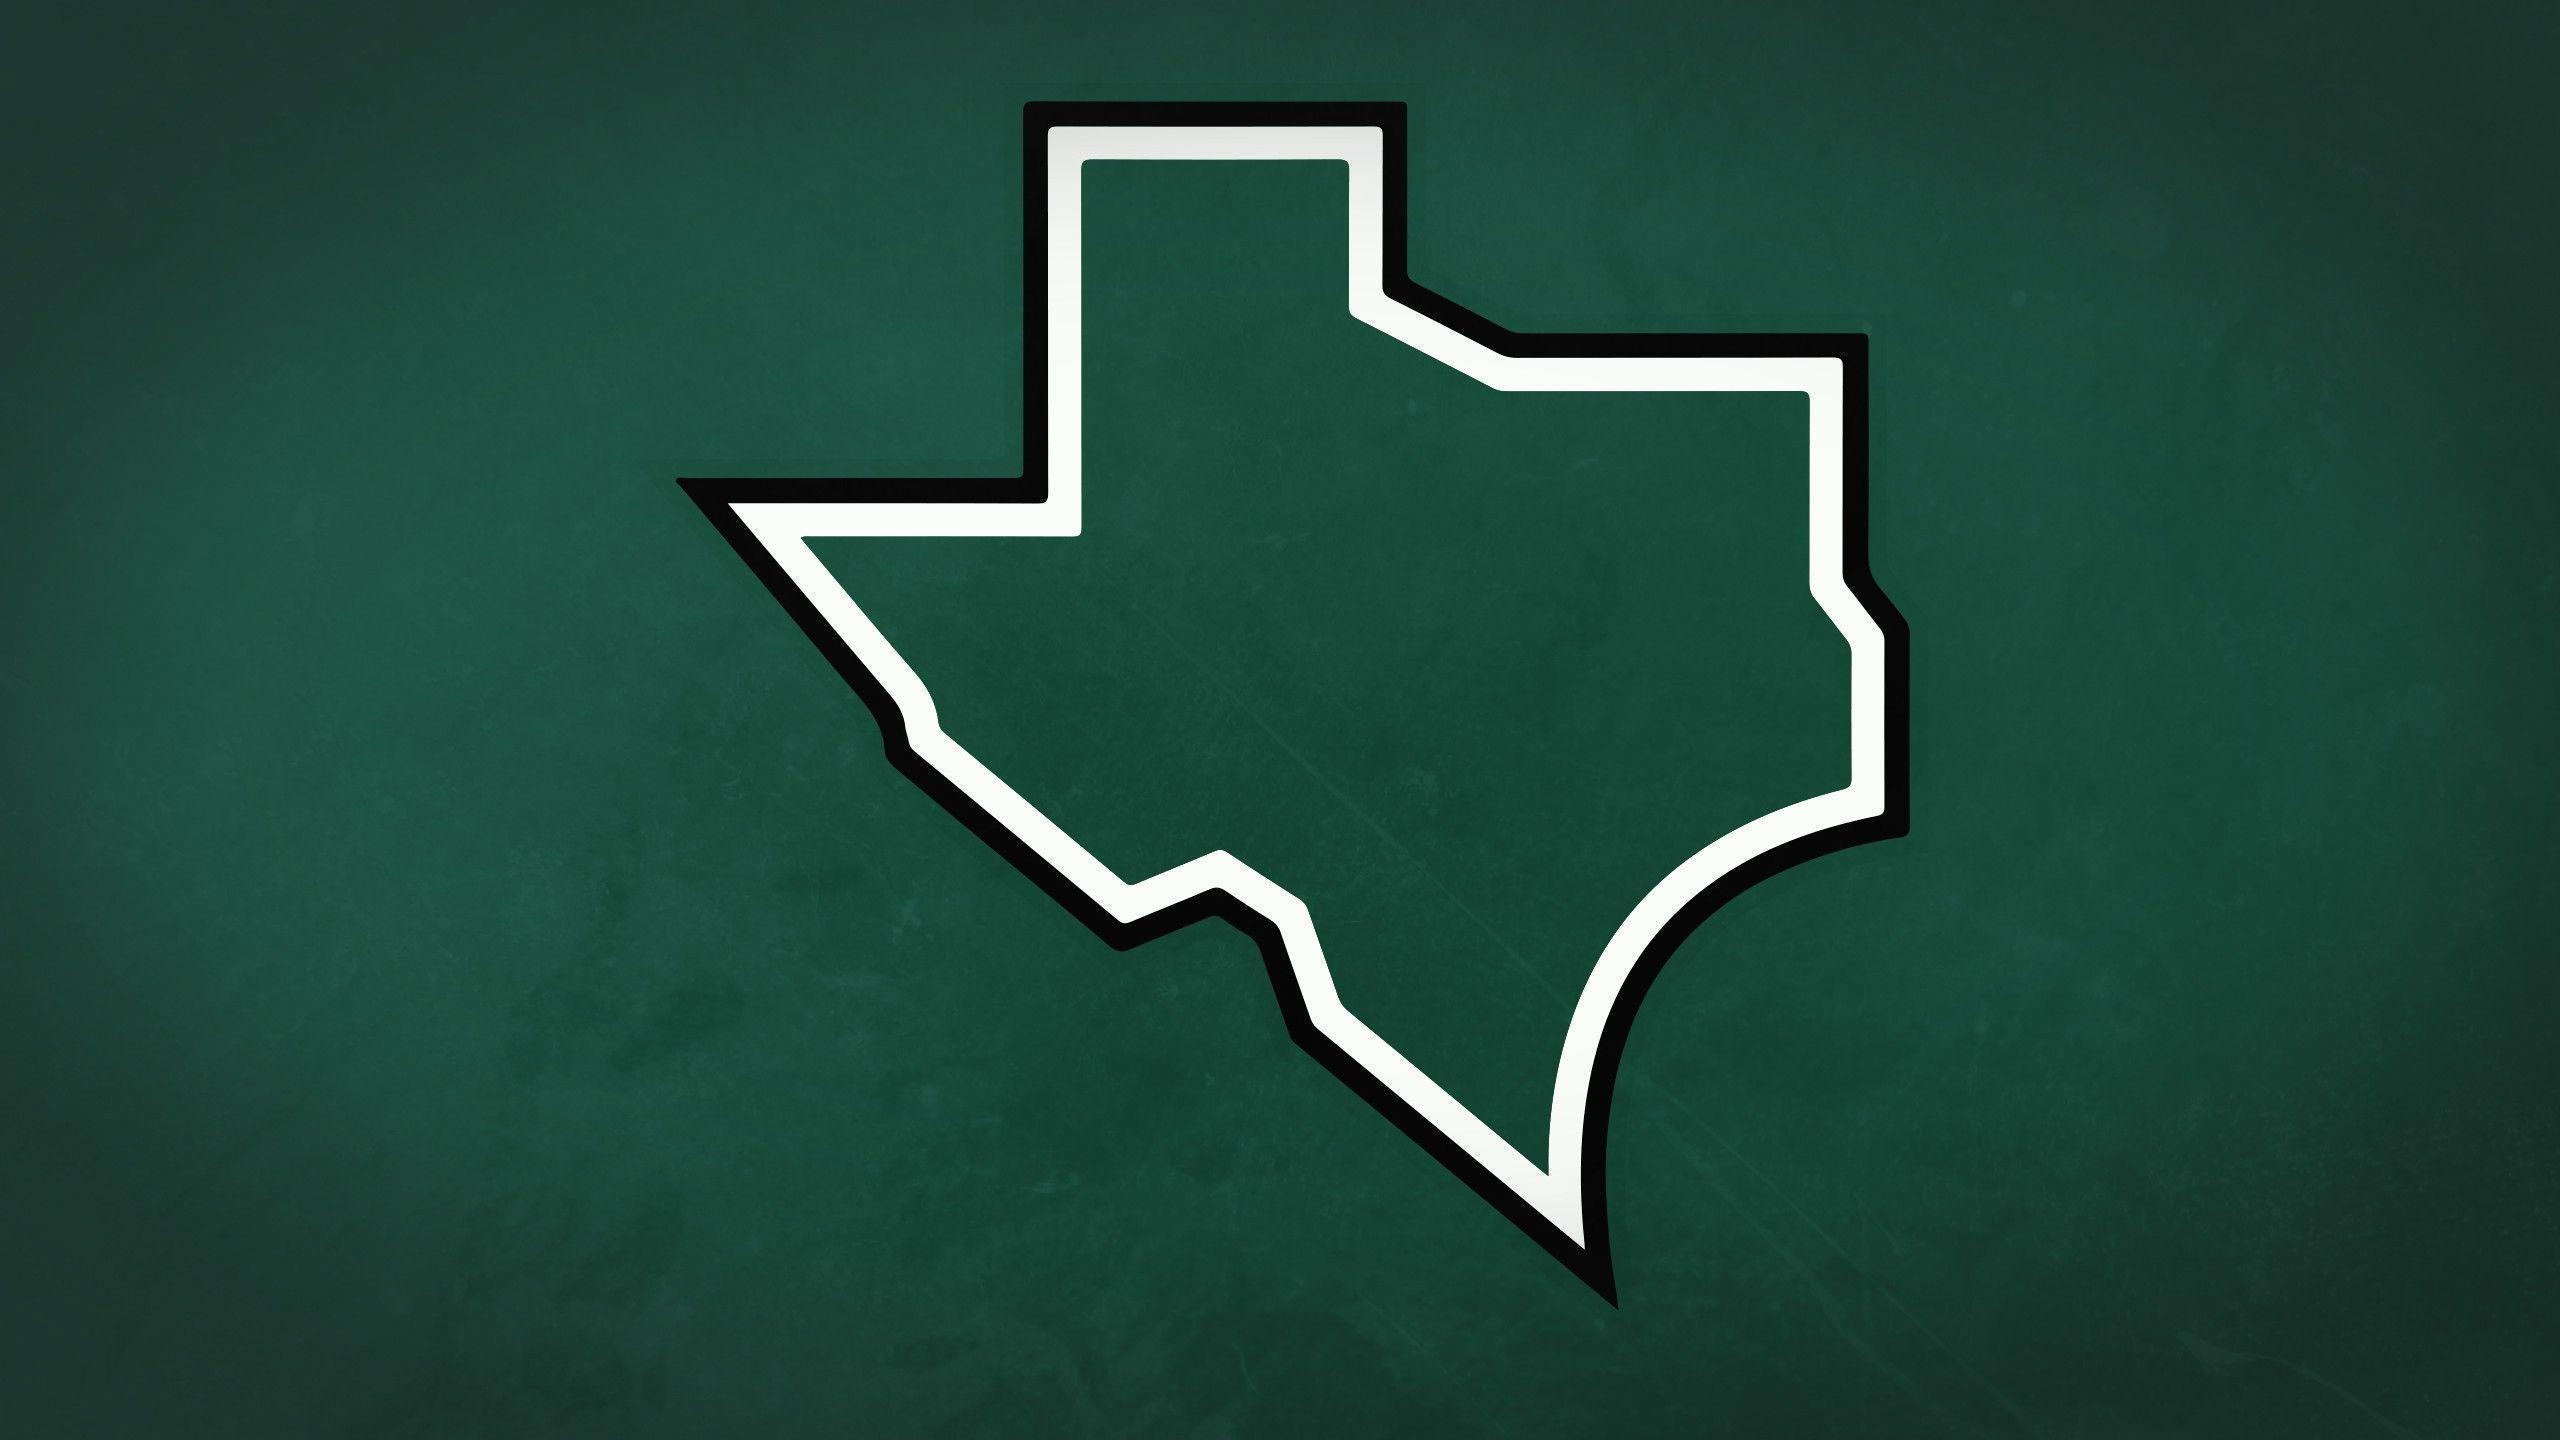 Dallas Stars HD Wallpaper - WallpaperSafari